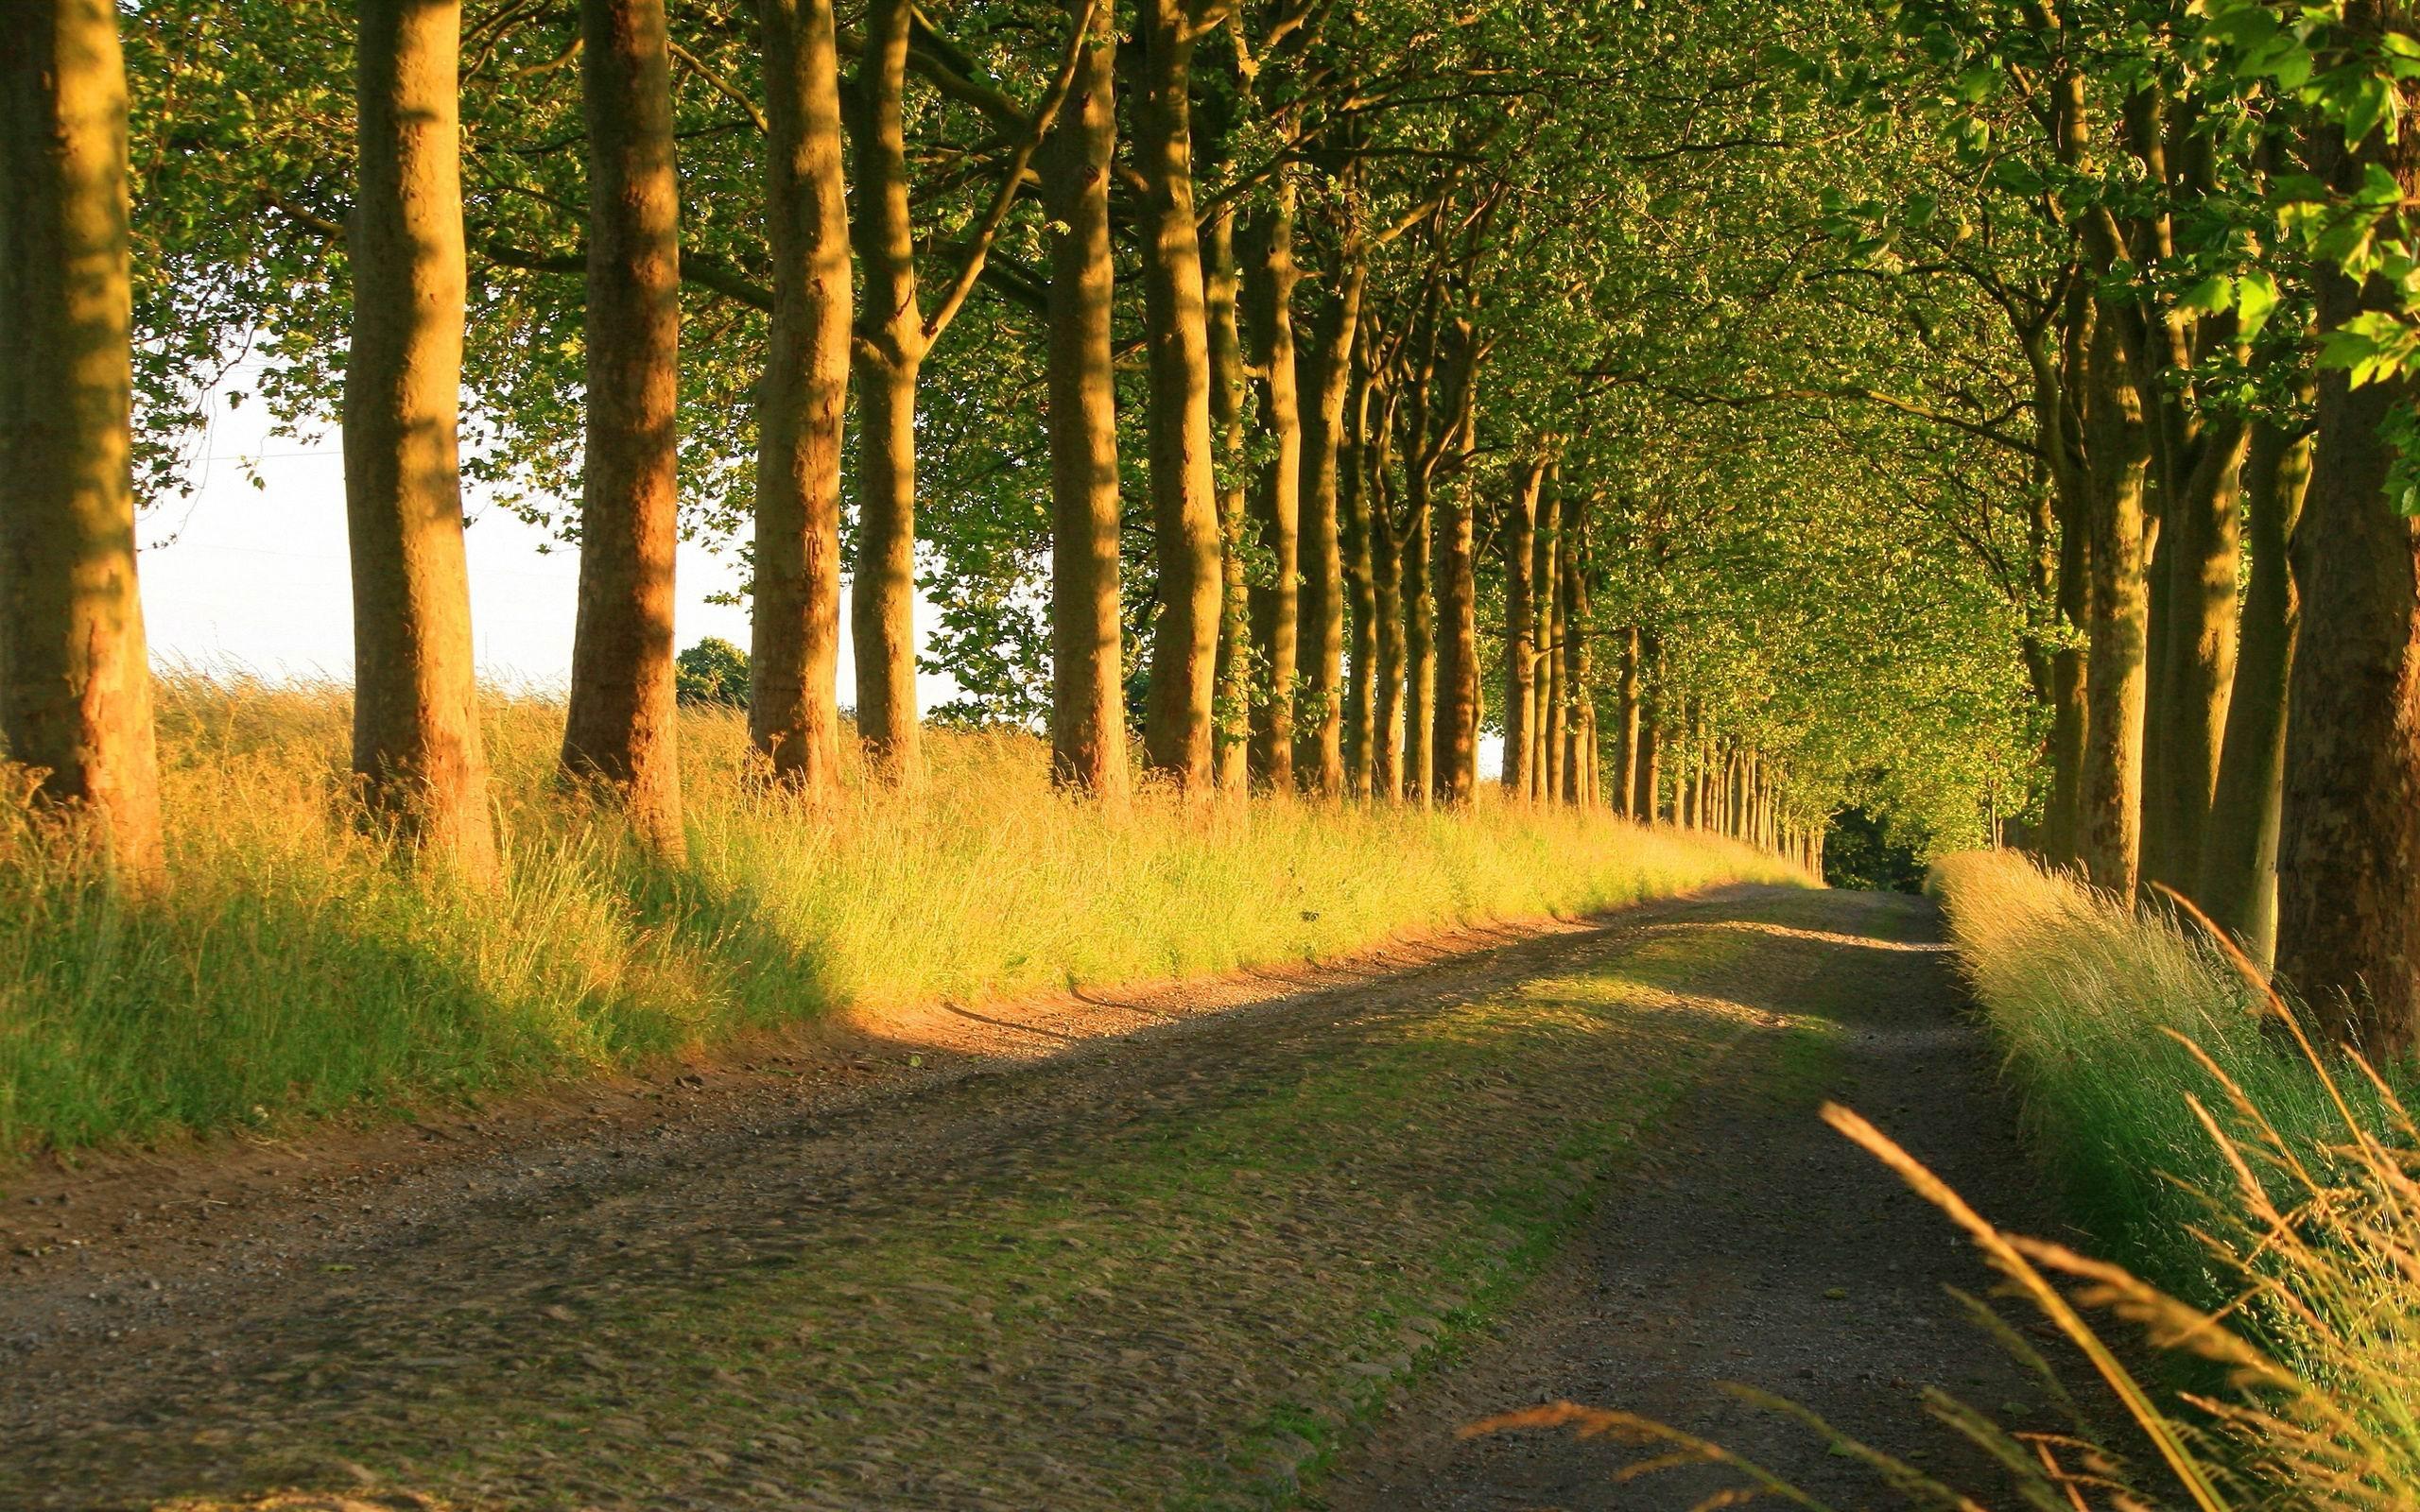 Belle Route Ensoleillee Hd Fond D Ecran Apercu 10wallpaper Com